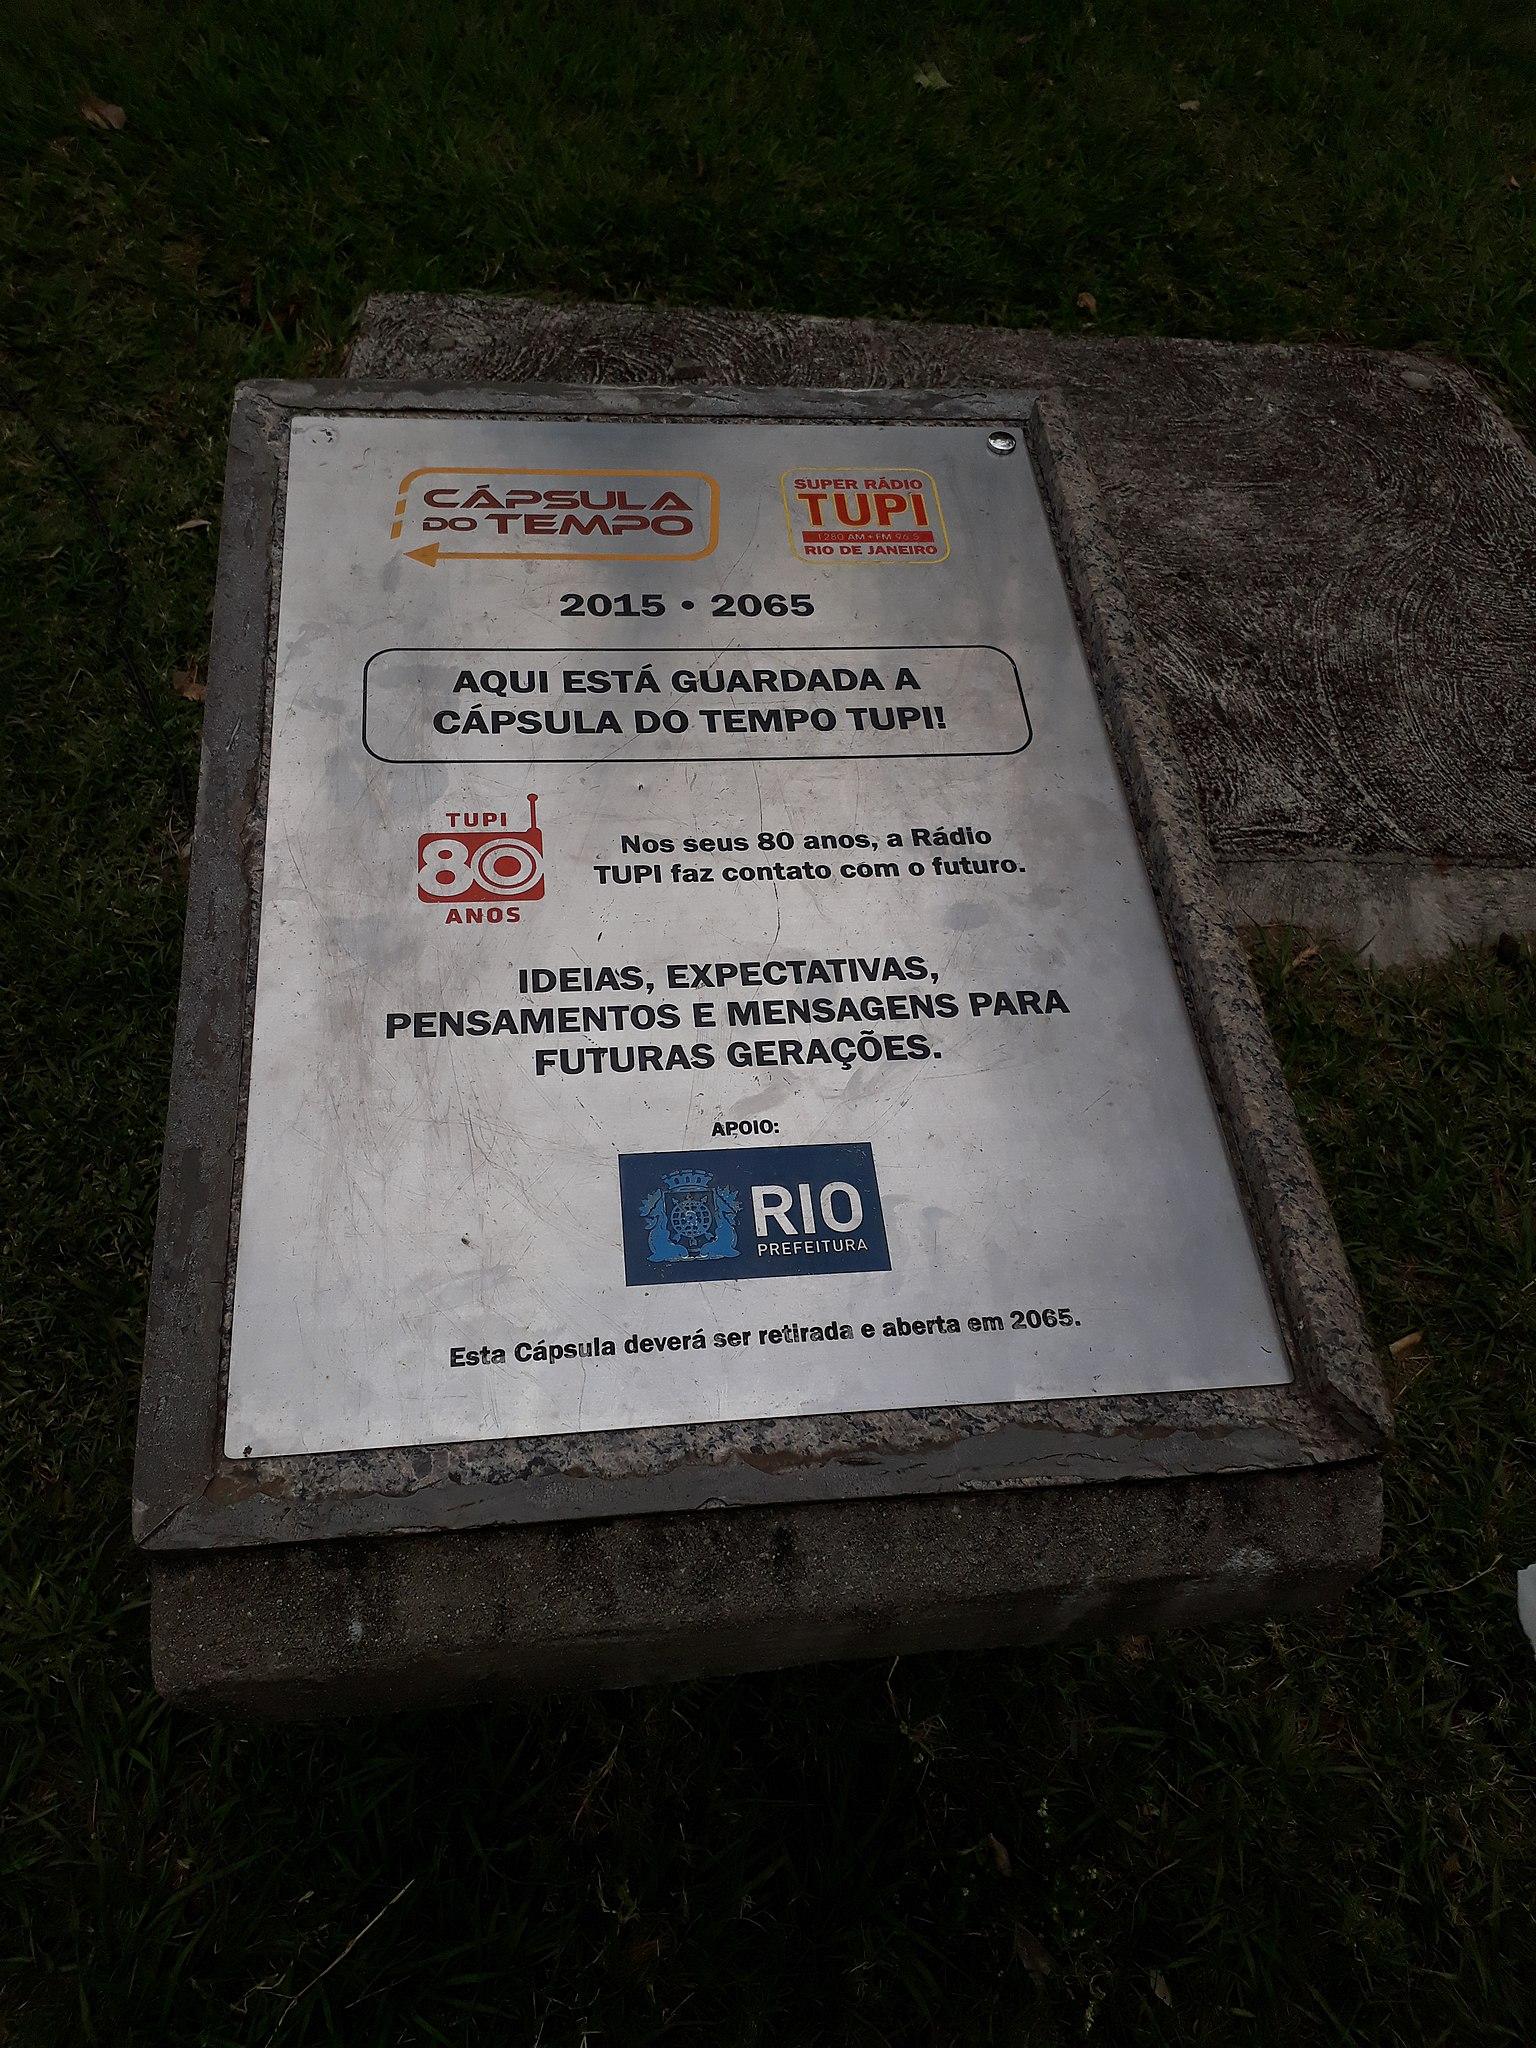 File:Cápsula do Tempo na Quinta da Boa Vista.jpg - Wikimedia Commons